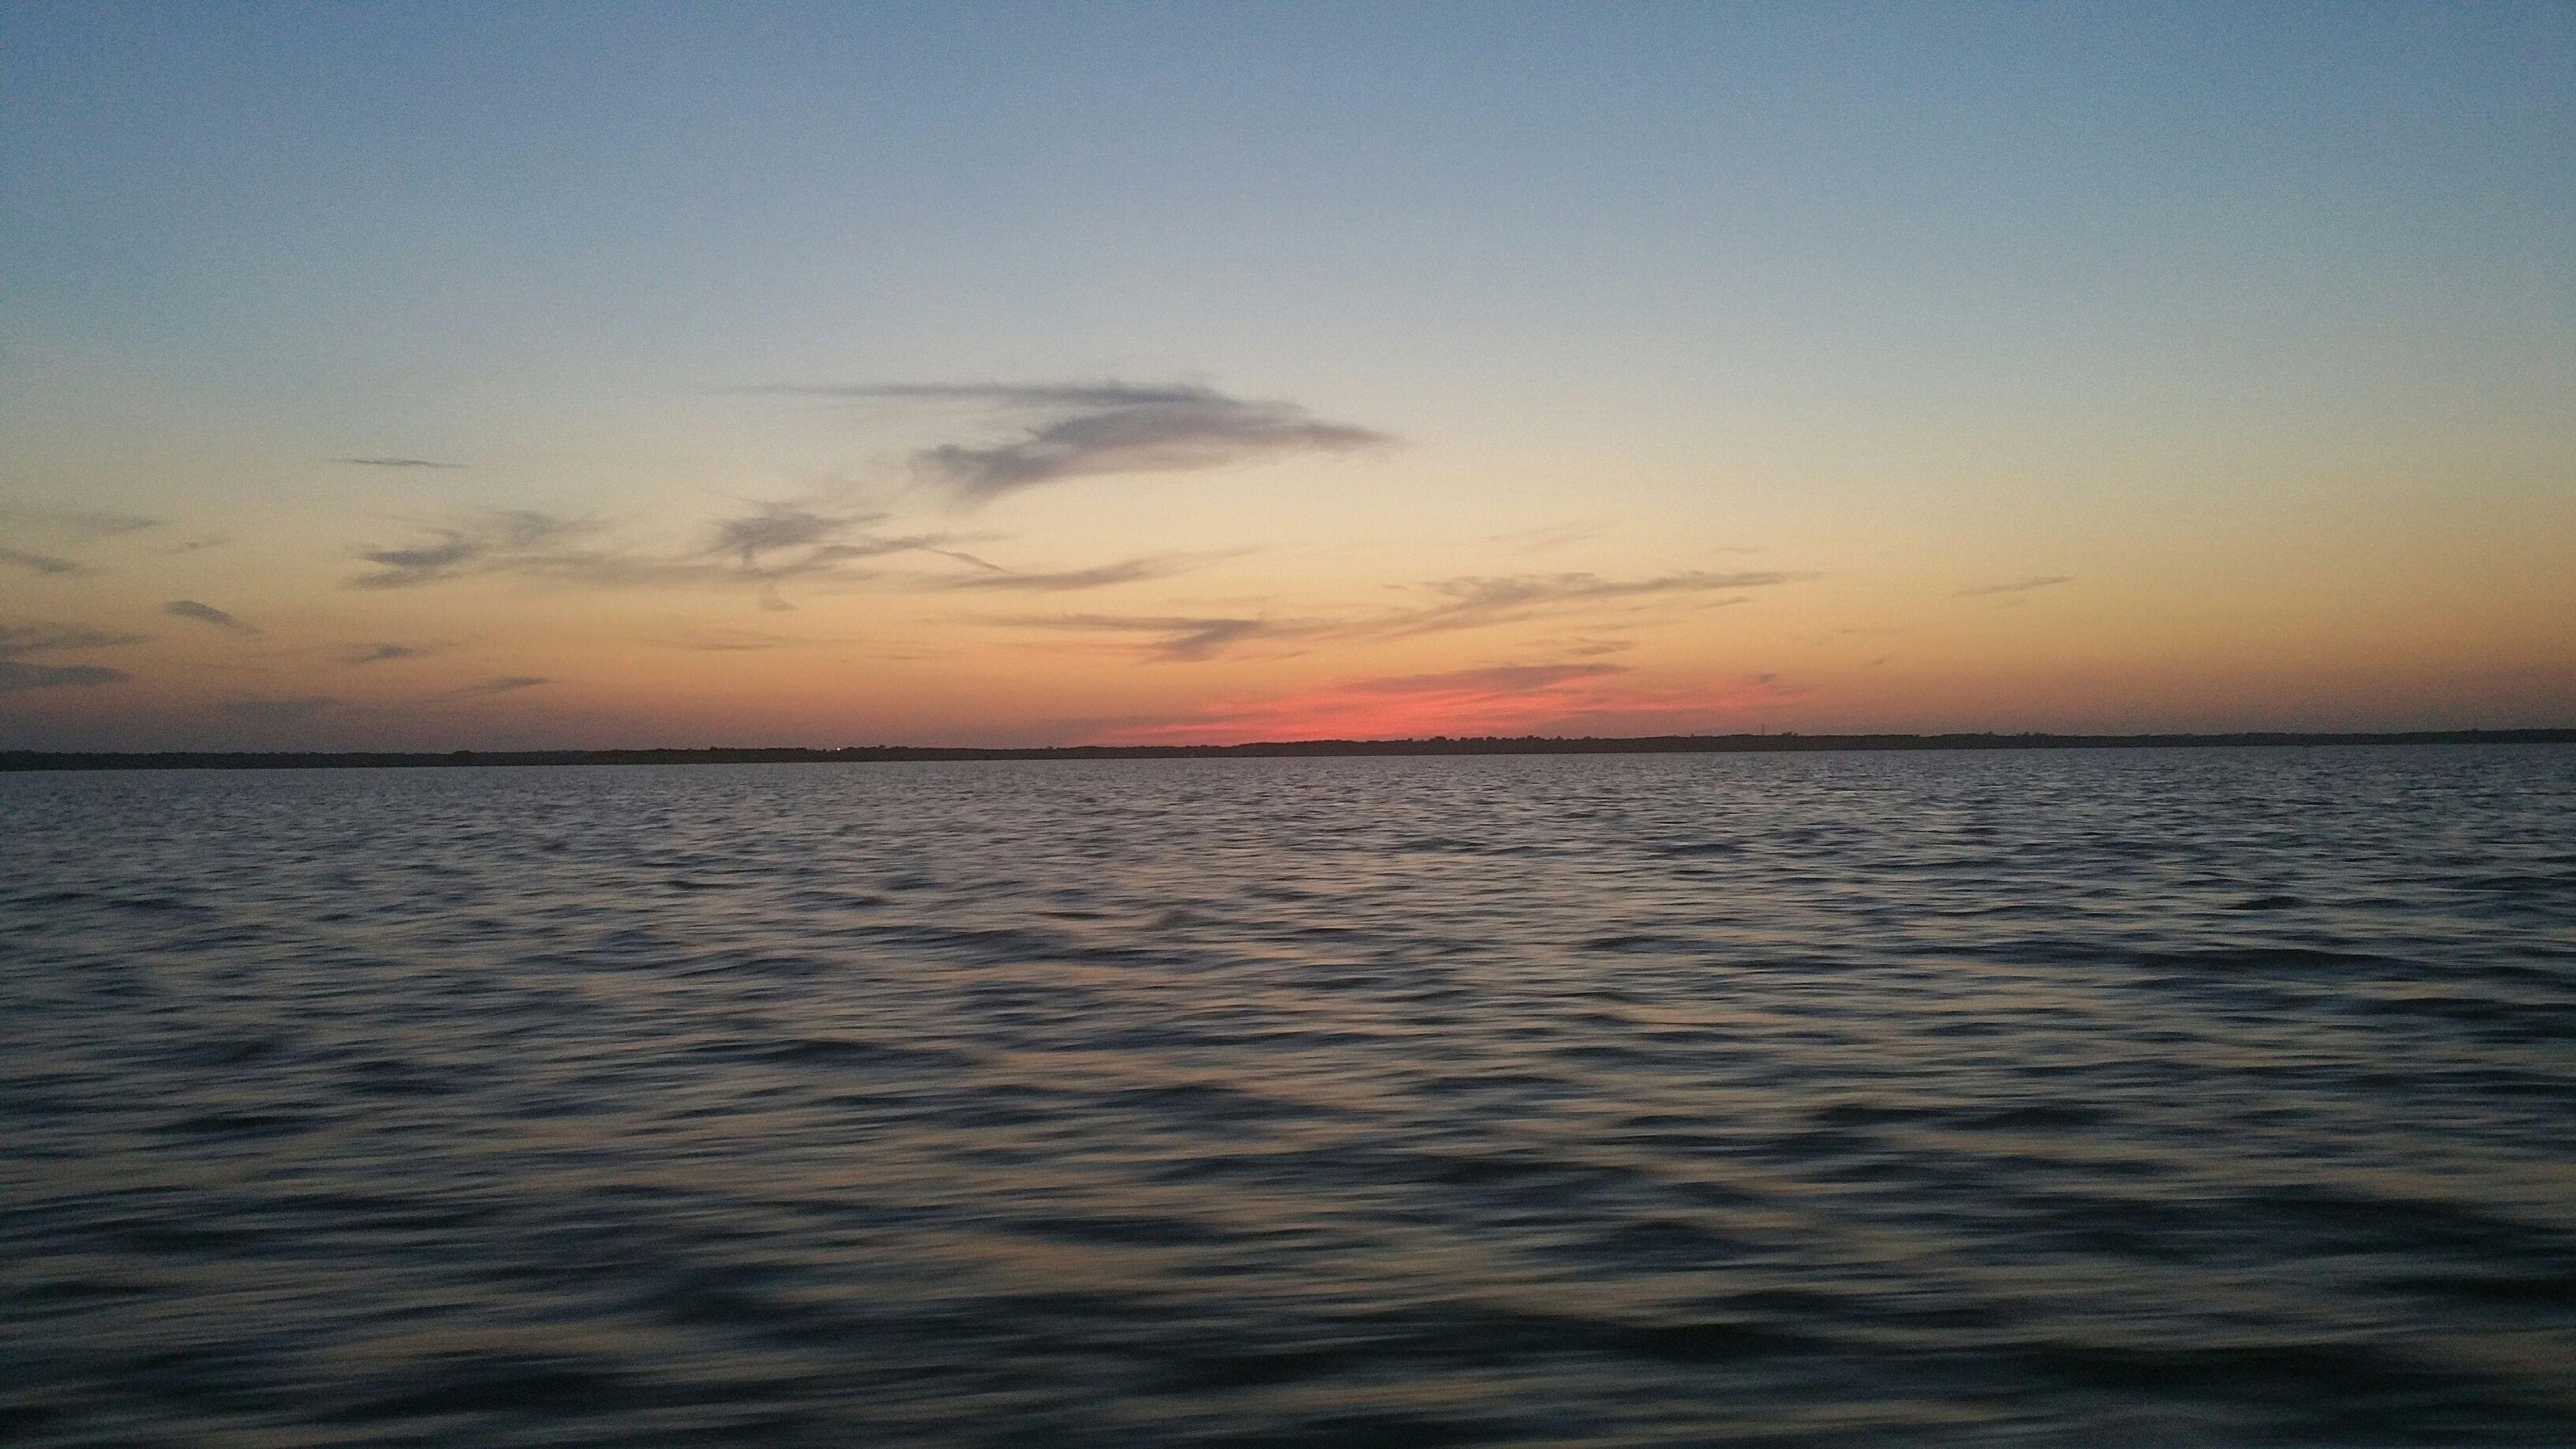 Edge Of The World milfird lake kansas EyeEm Best Shots - Sunsets + Sunrise